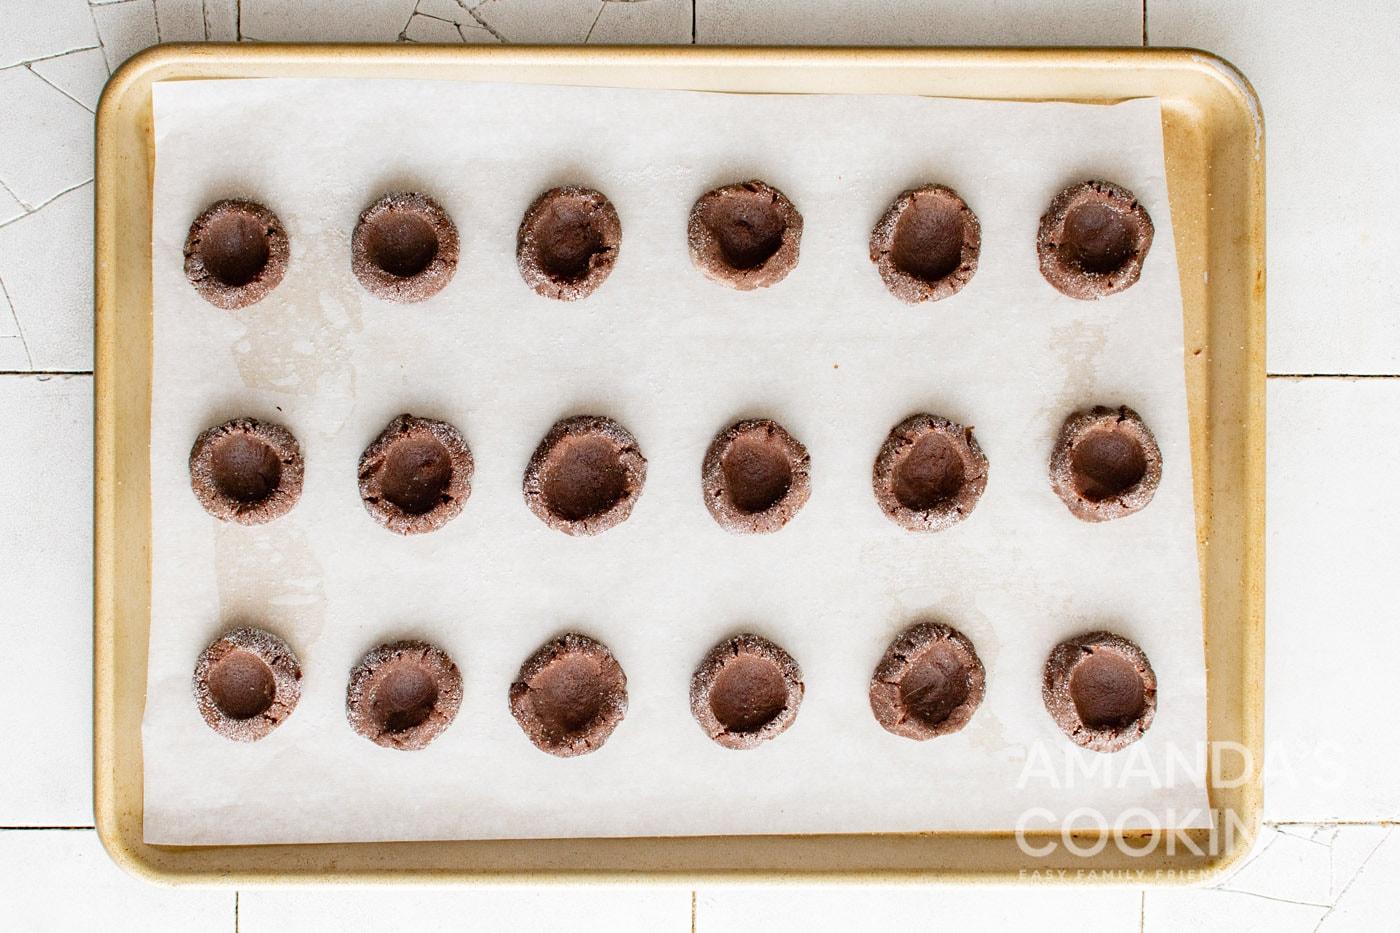 indents in cookie dough balls